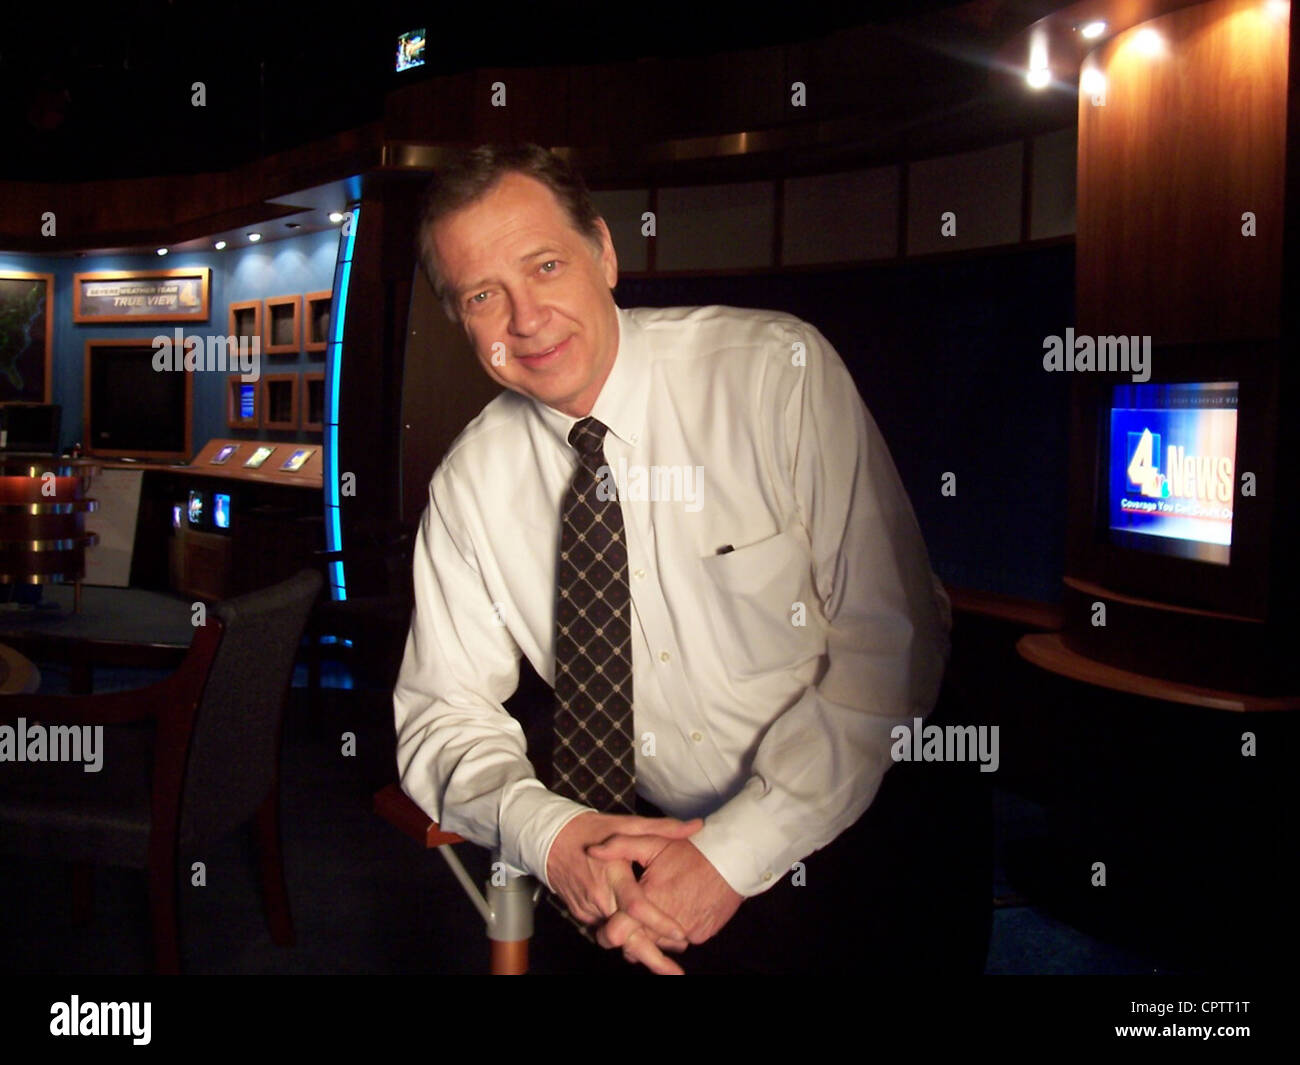 News personality Dan Miller, taken inside the WSMV-TV studios in Nashville, Tennessee. - Stock Image